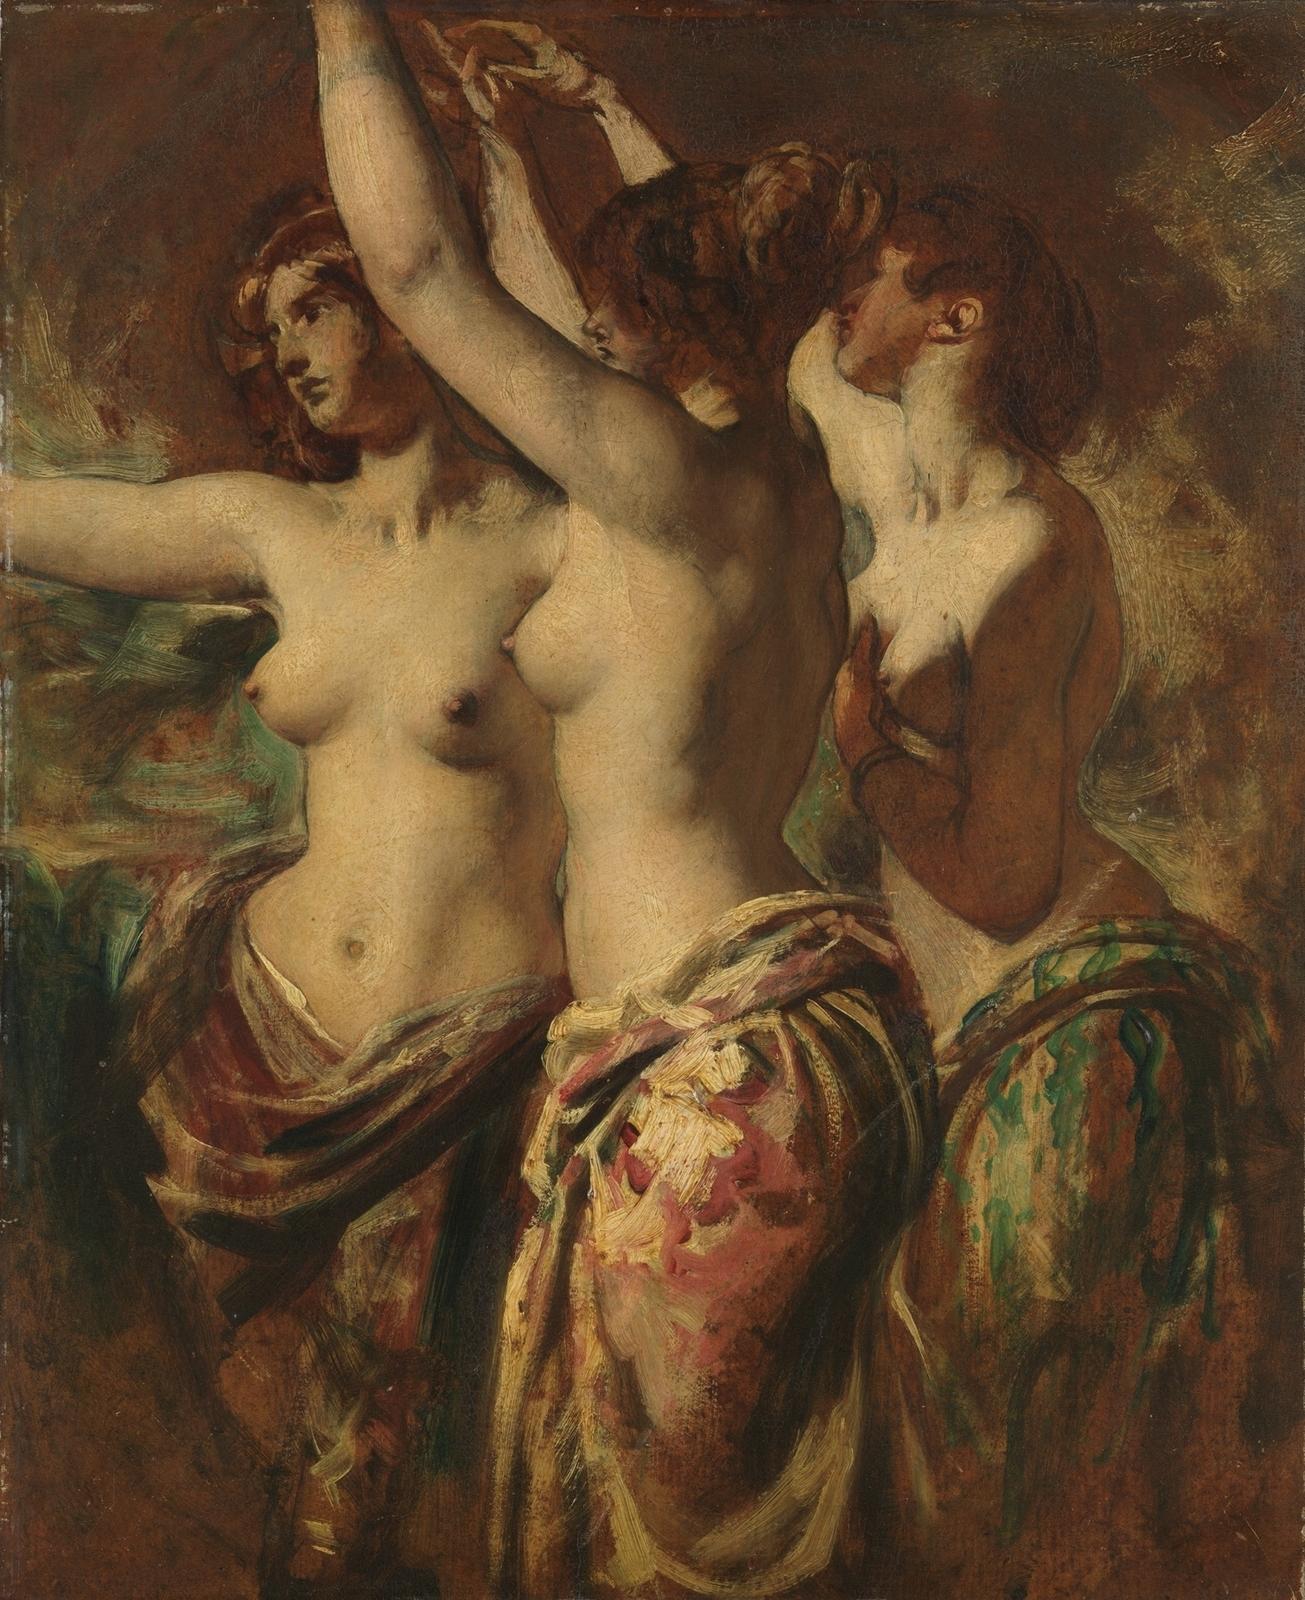 Уильям Этти. Три грации (The Three Graces). 57.2 x 47.6. Нью-Йорк, музей Метрополитен.